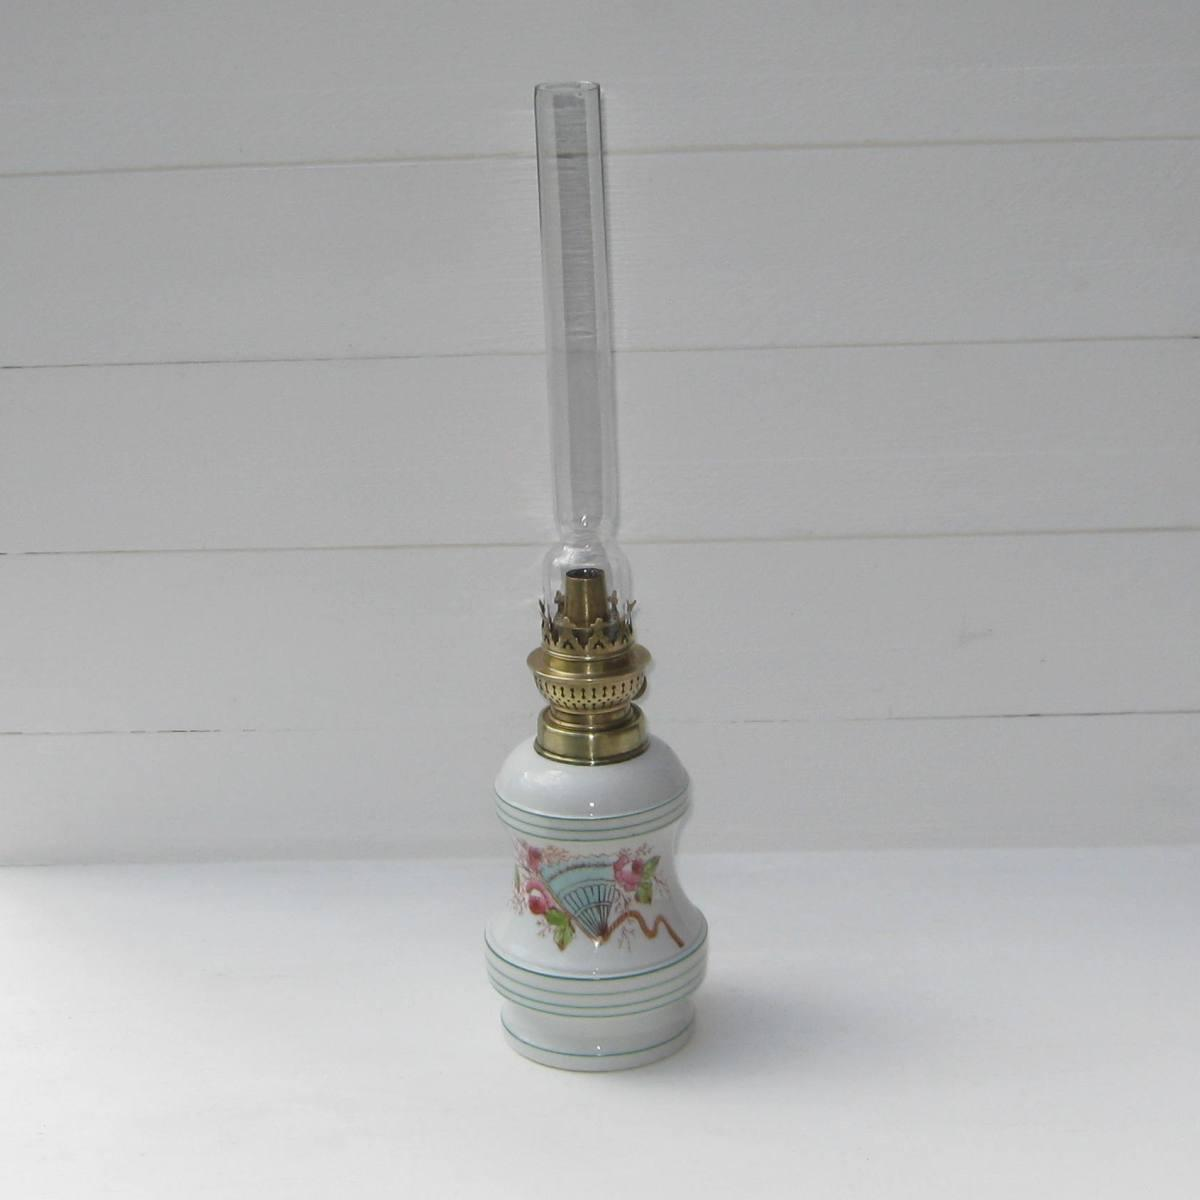 Ancienne lampe a petrole decor eventail 1